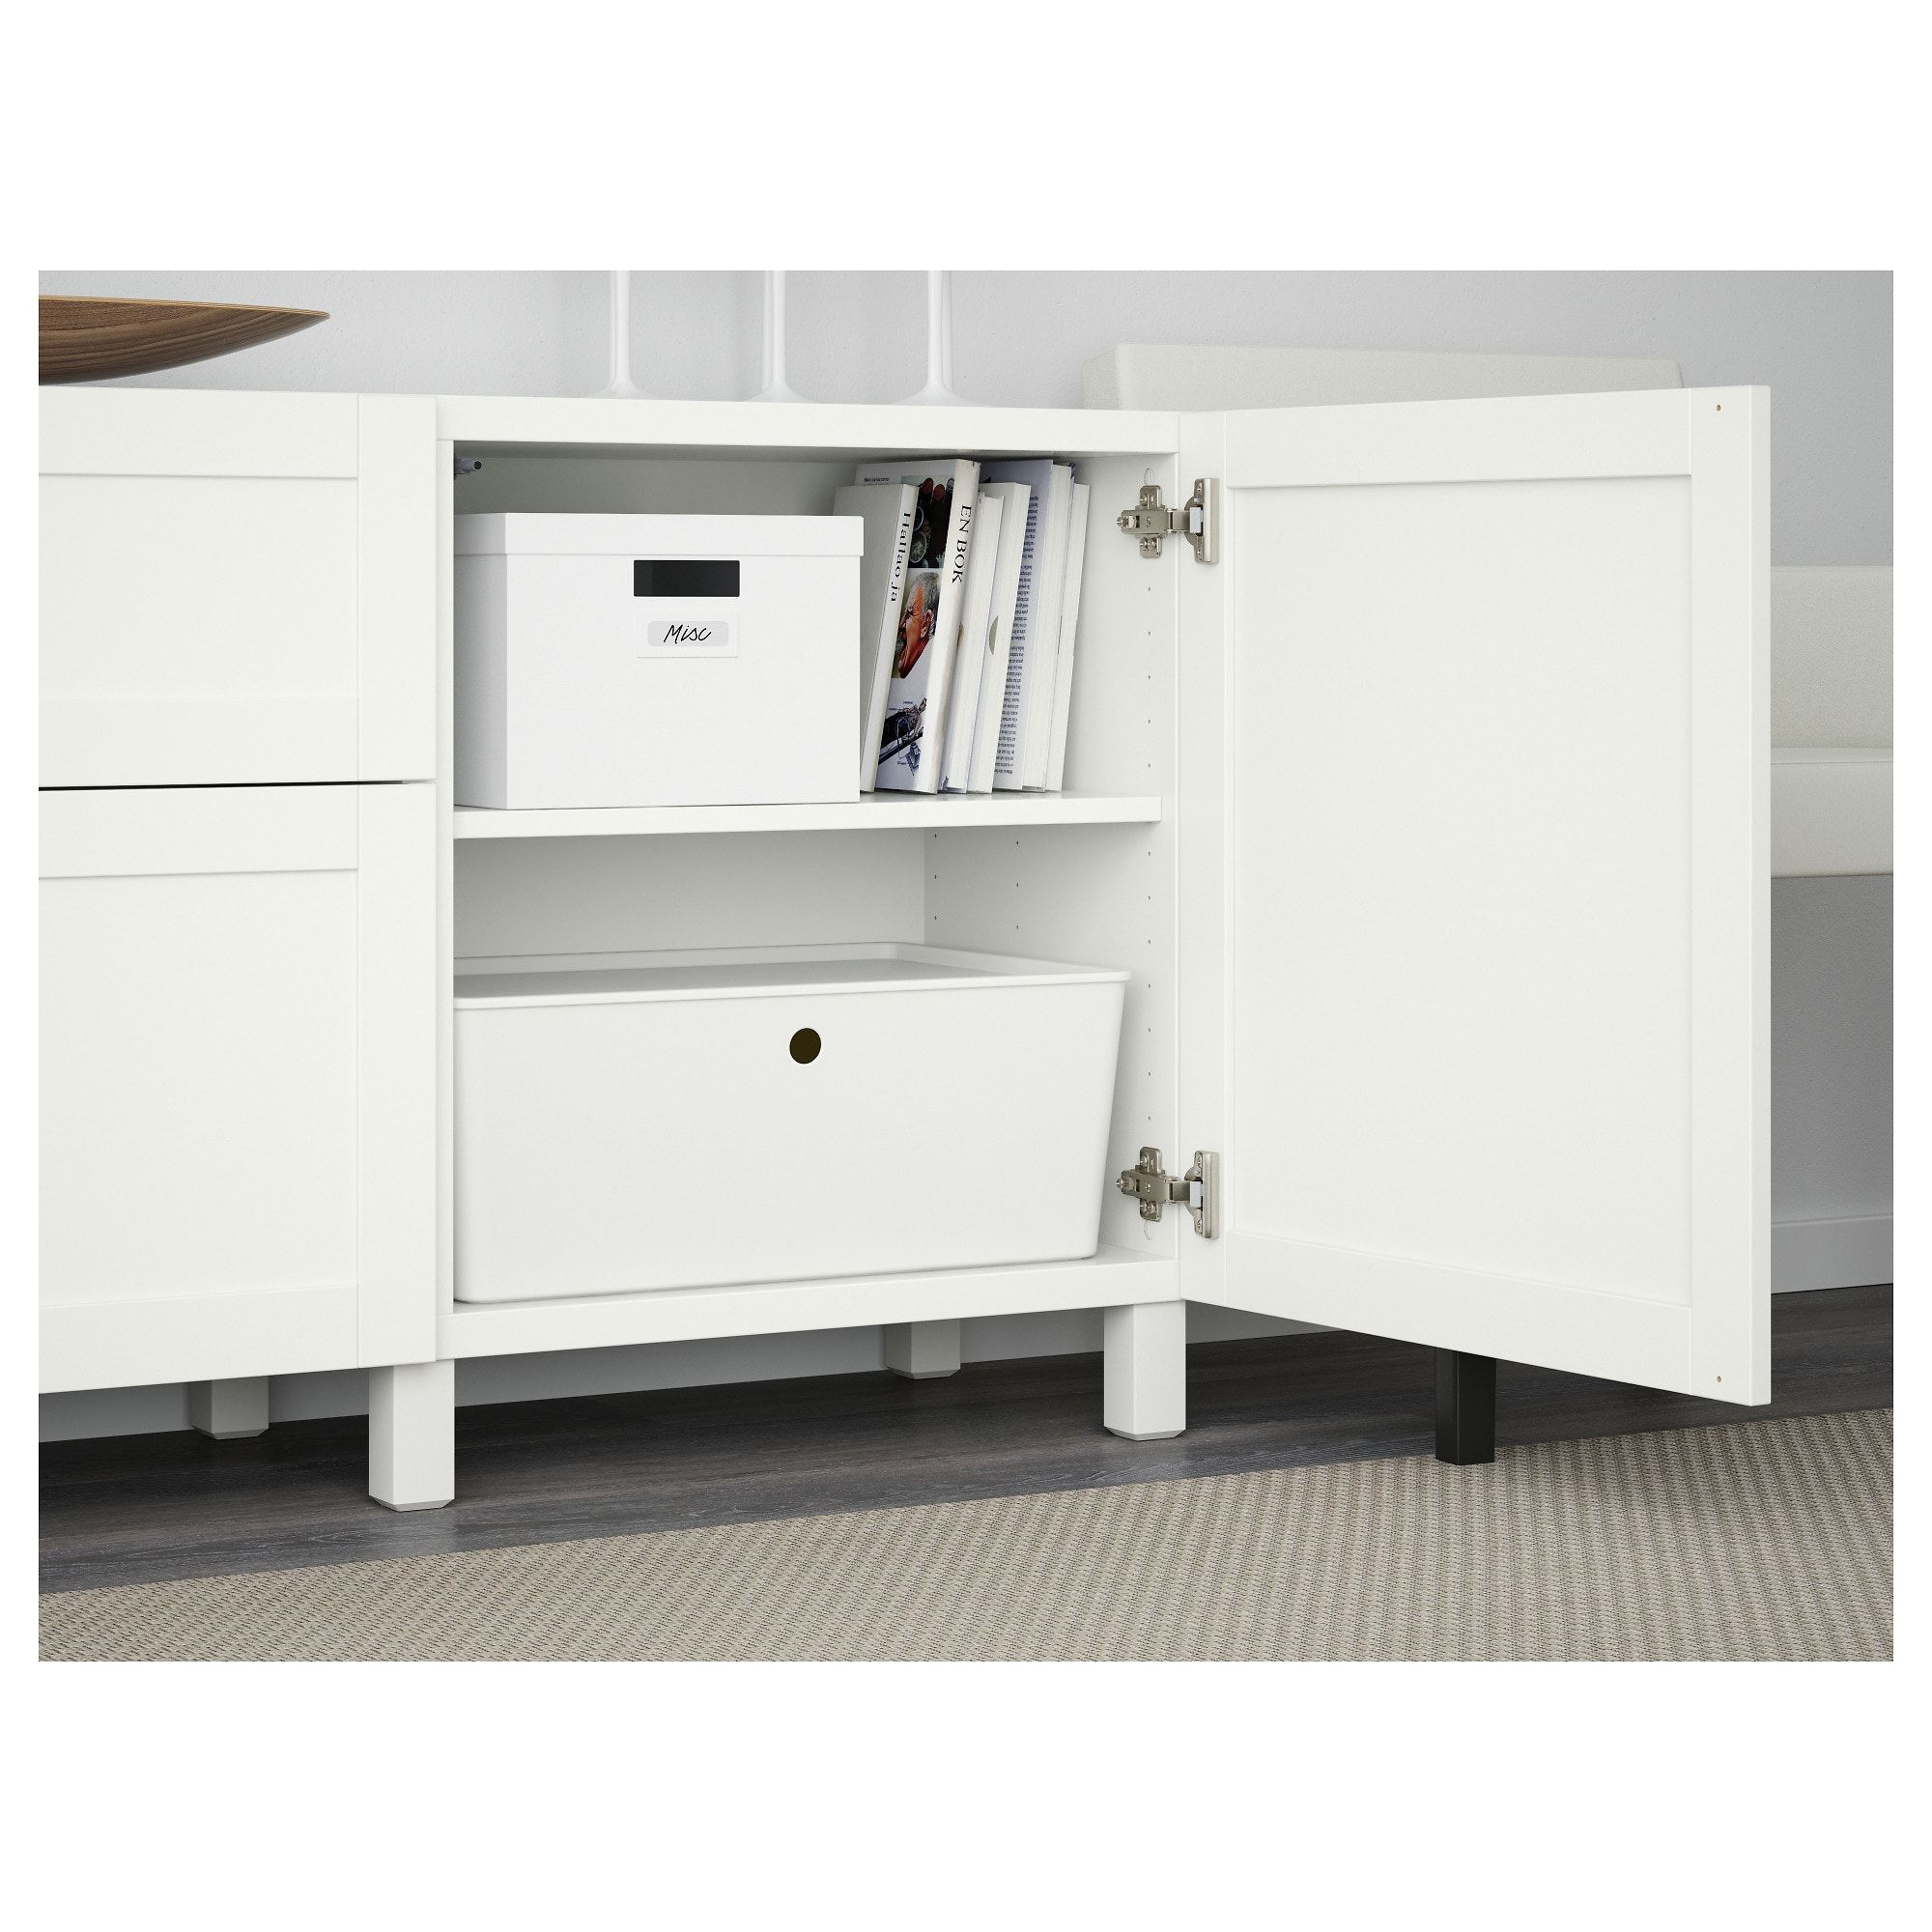 IKEA BESTA Hanviken White Storage combination with drawers